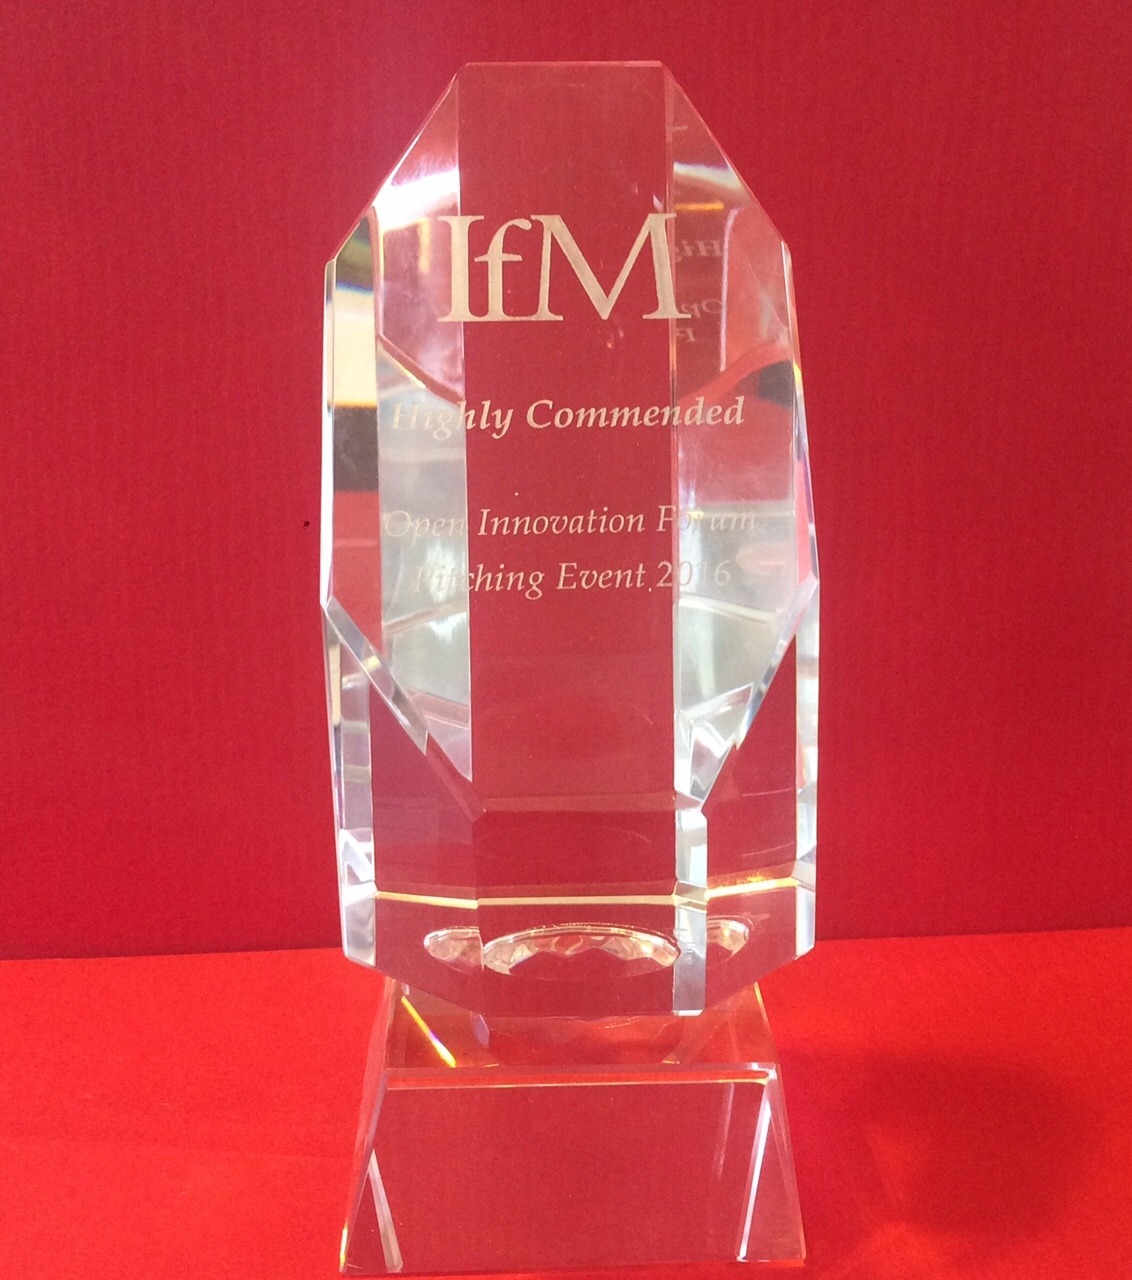 Nim's Fruit Crisps is an open innovation award winner at food matters live 2016